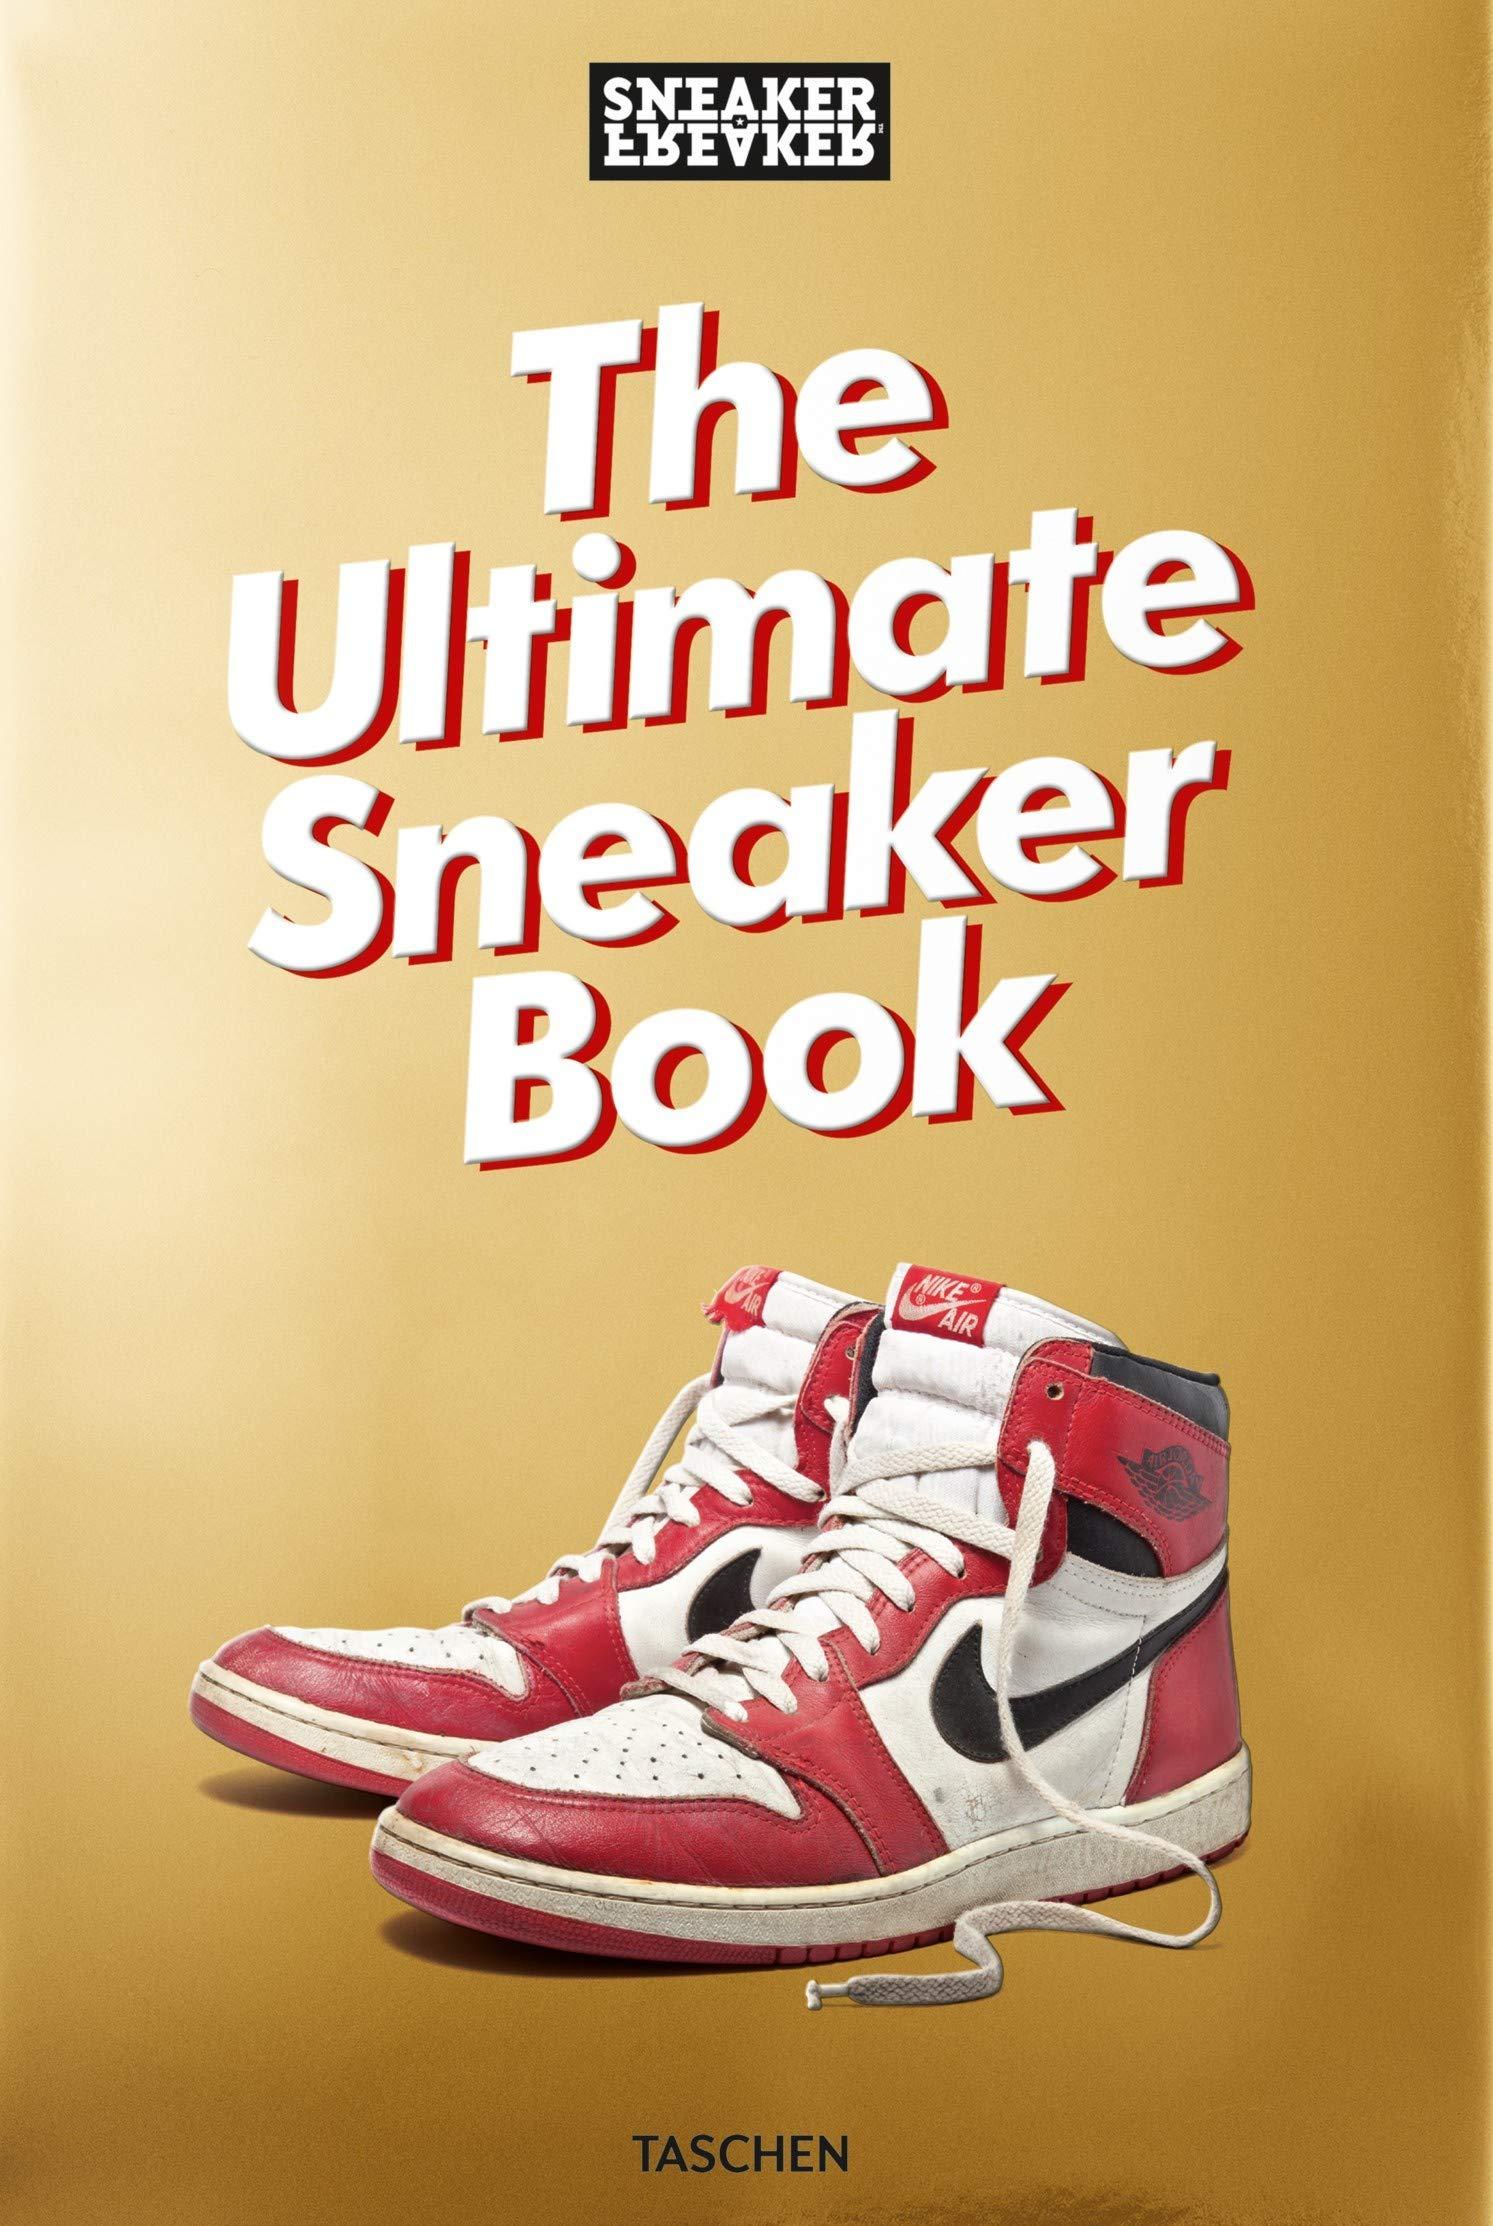 The Air Max 95 Is Now On Nike Id Australia Sneaker Freaker